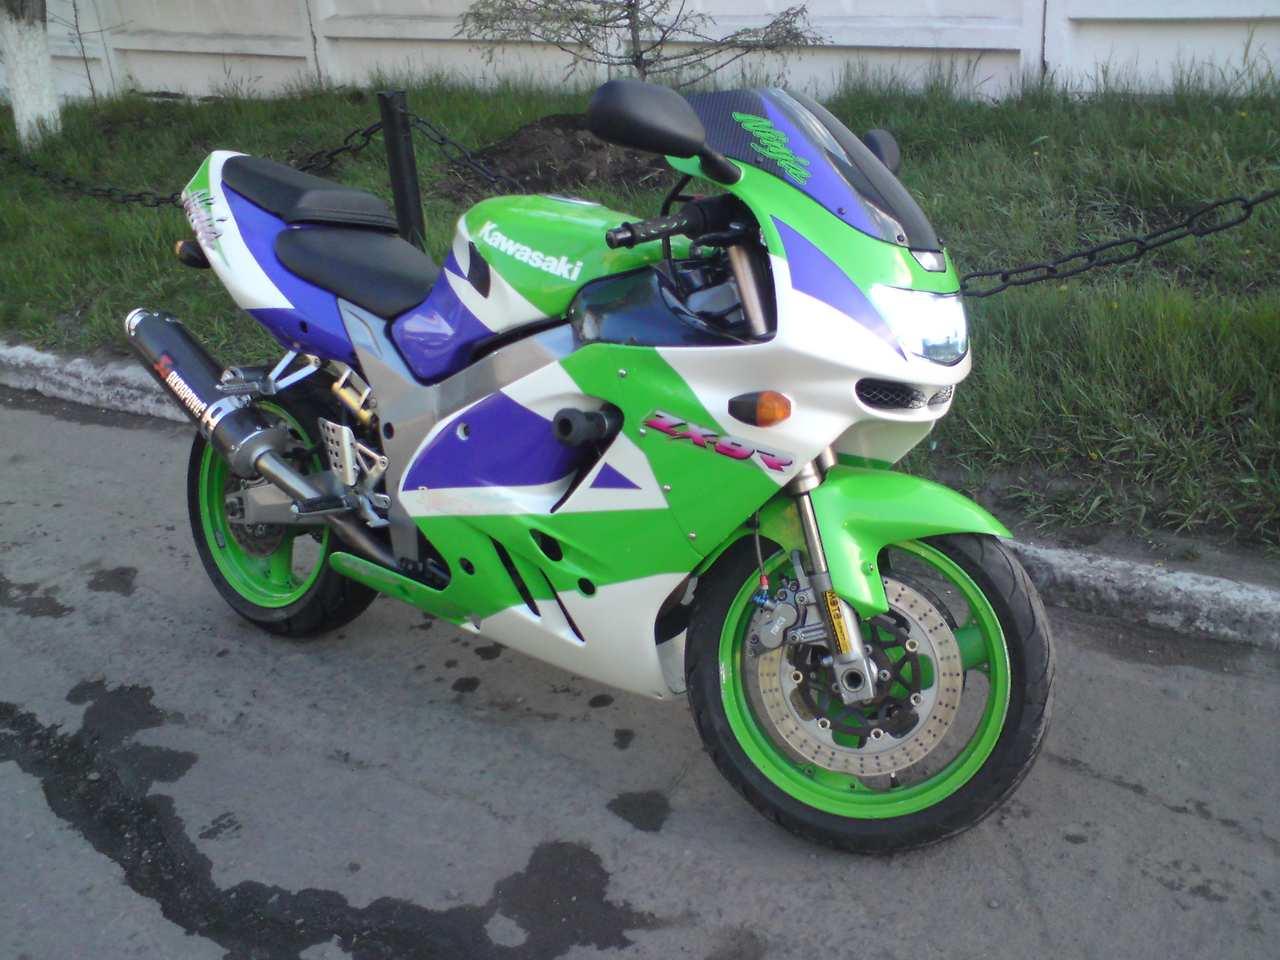 1996 Kawasaki ZX-7R Ninja - Moto.ZombDrive.COM